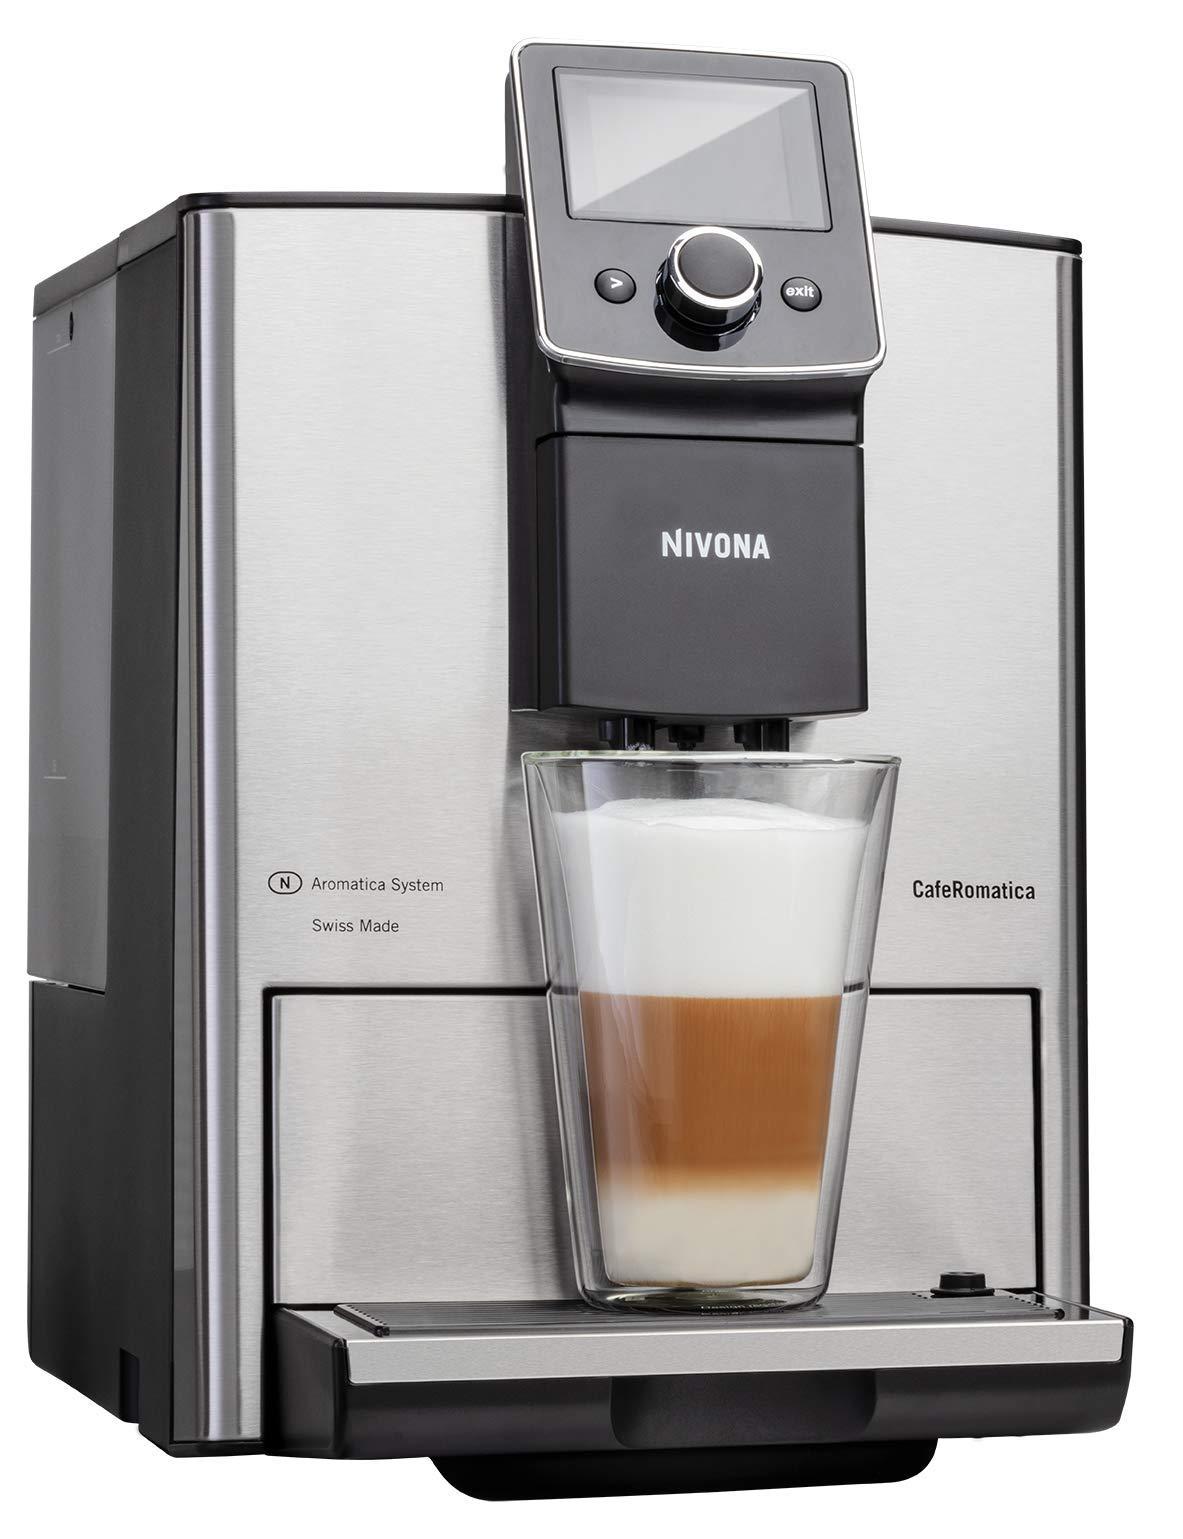 NIVONA-NICR-825-CafeRomatica-Kaffeevollautomat-15-bar-silber-ECO-Modus